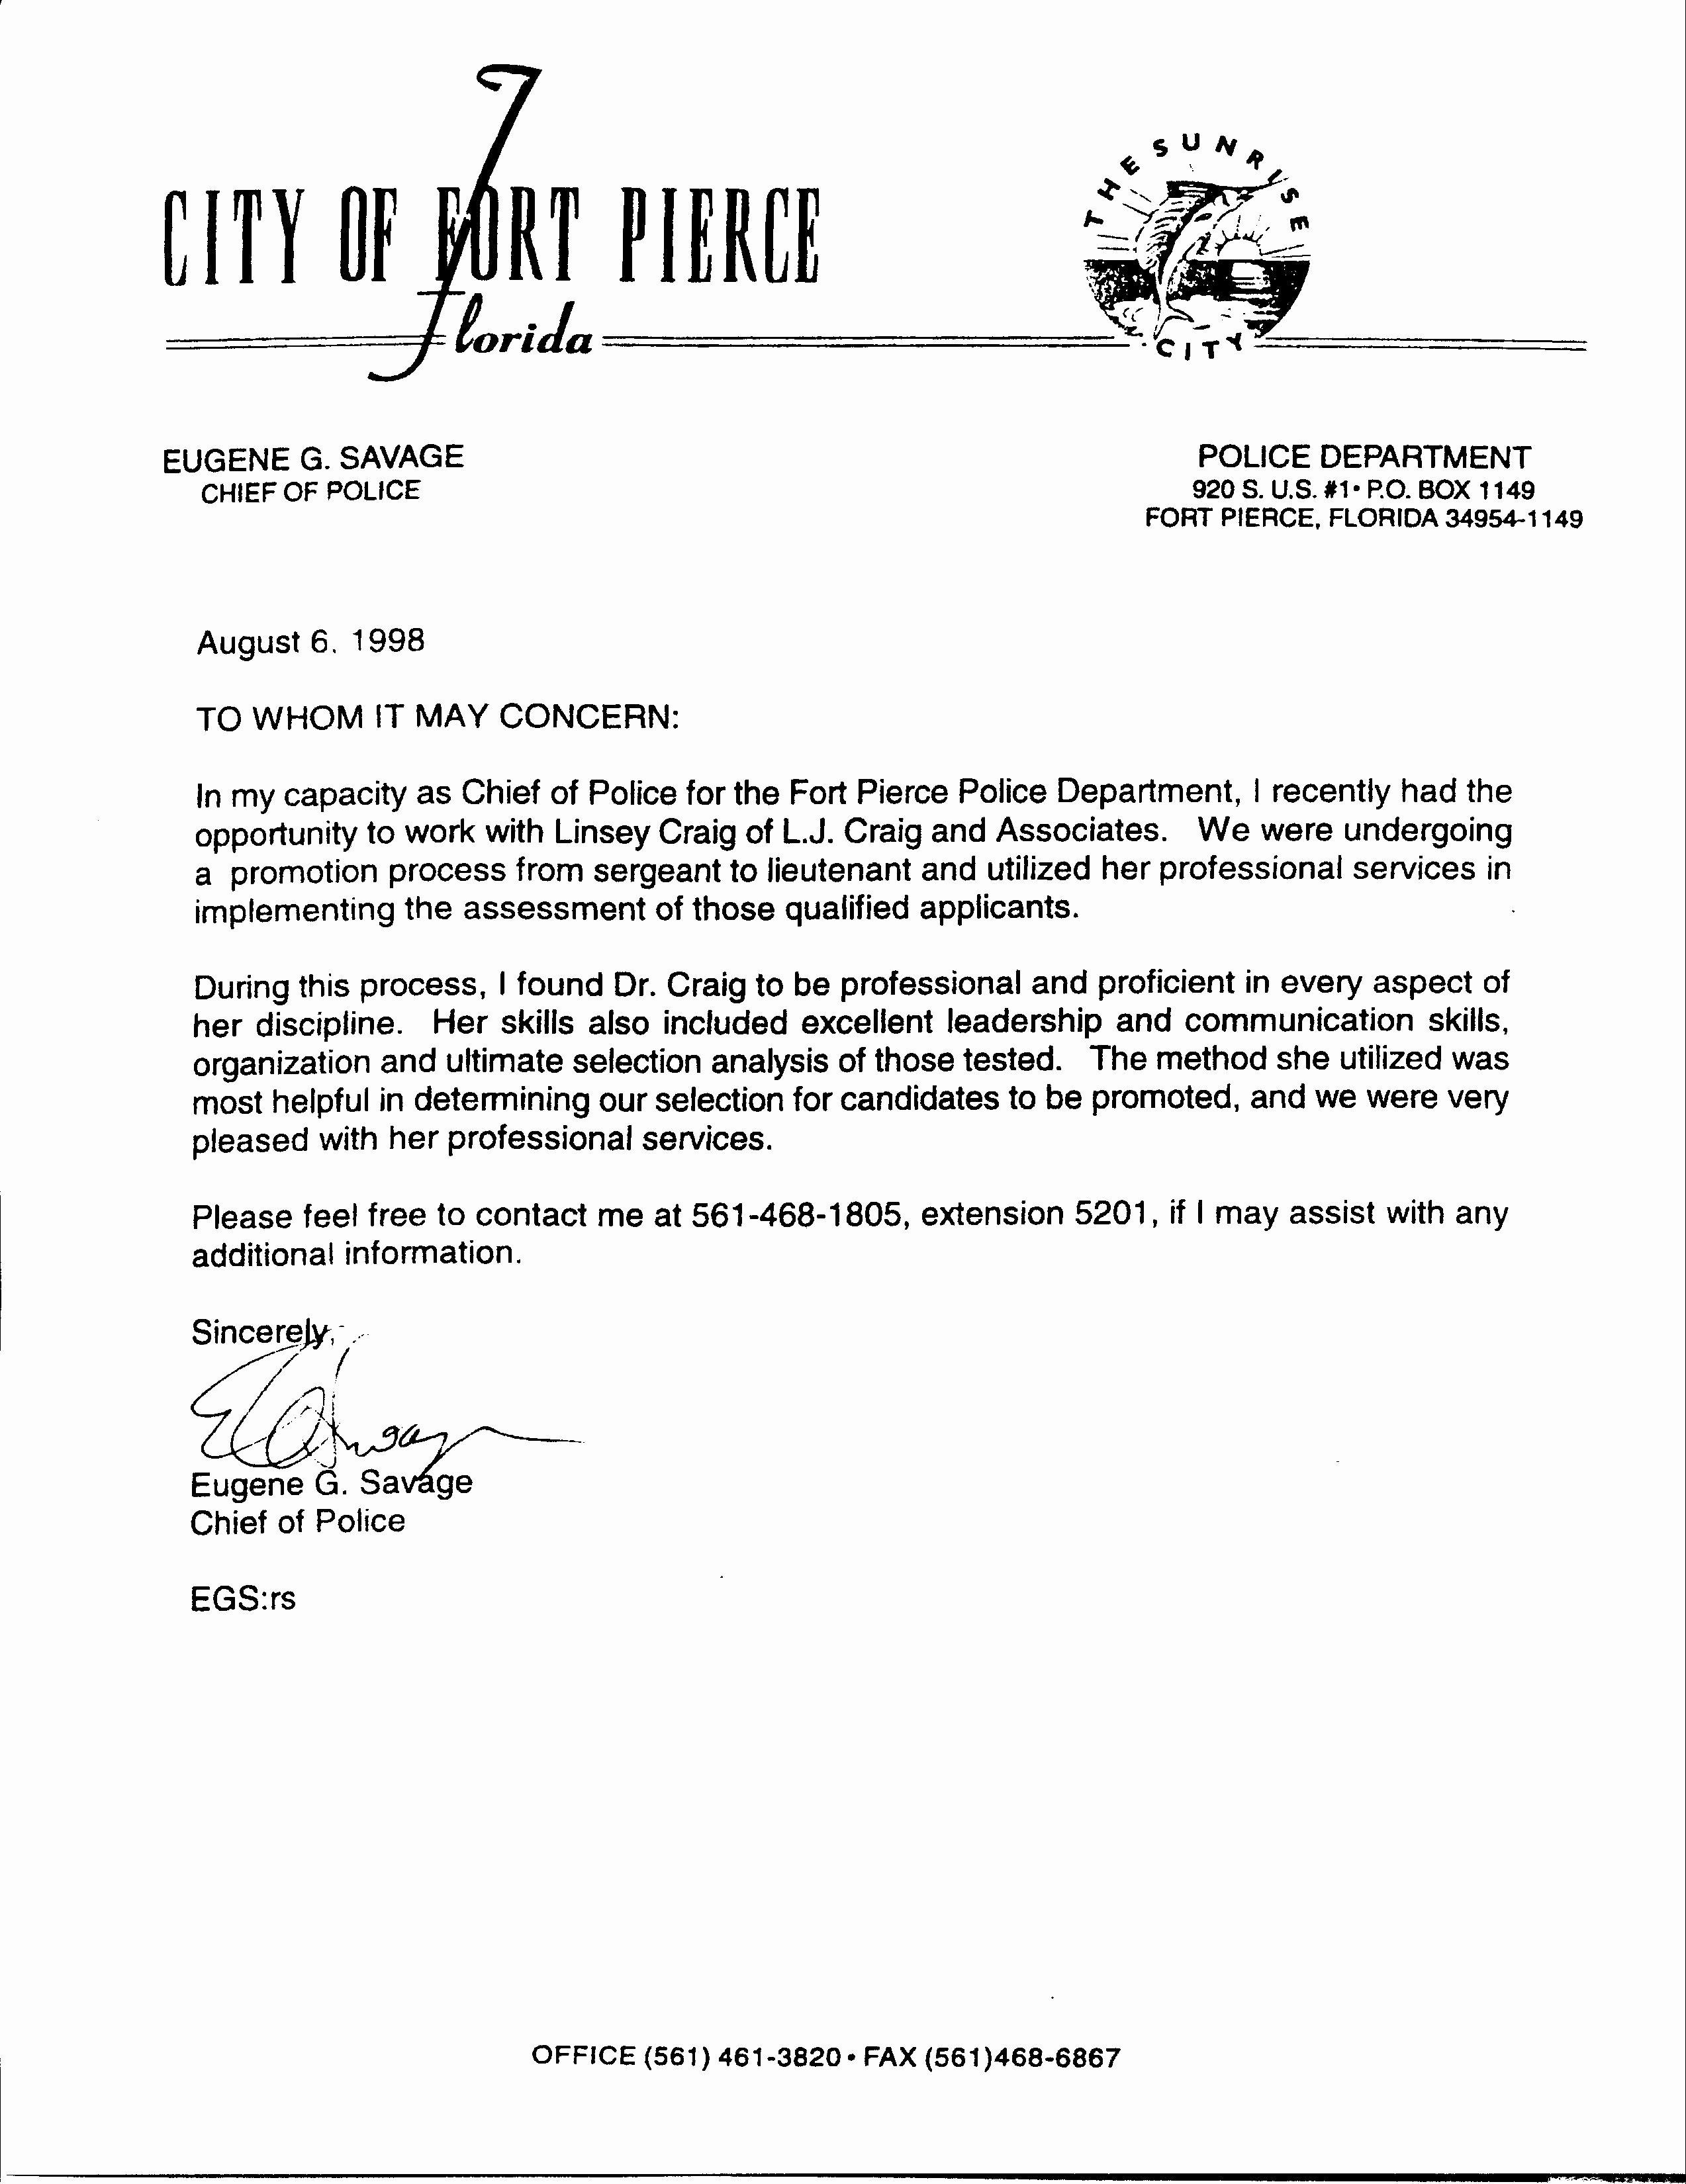 Law Enforcement Letter Of Recommendation Unique Promotional Exams and assessment Centers for Law Enforcement